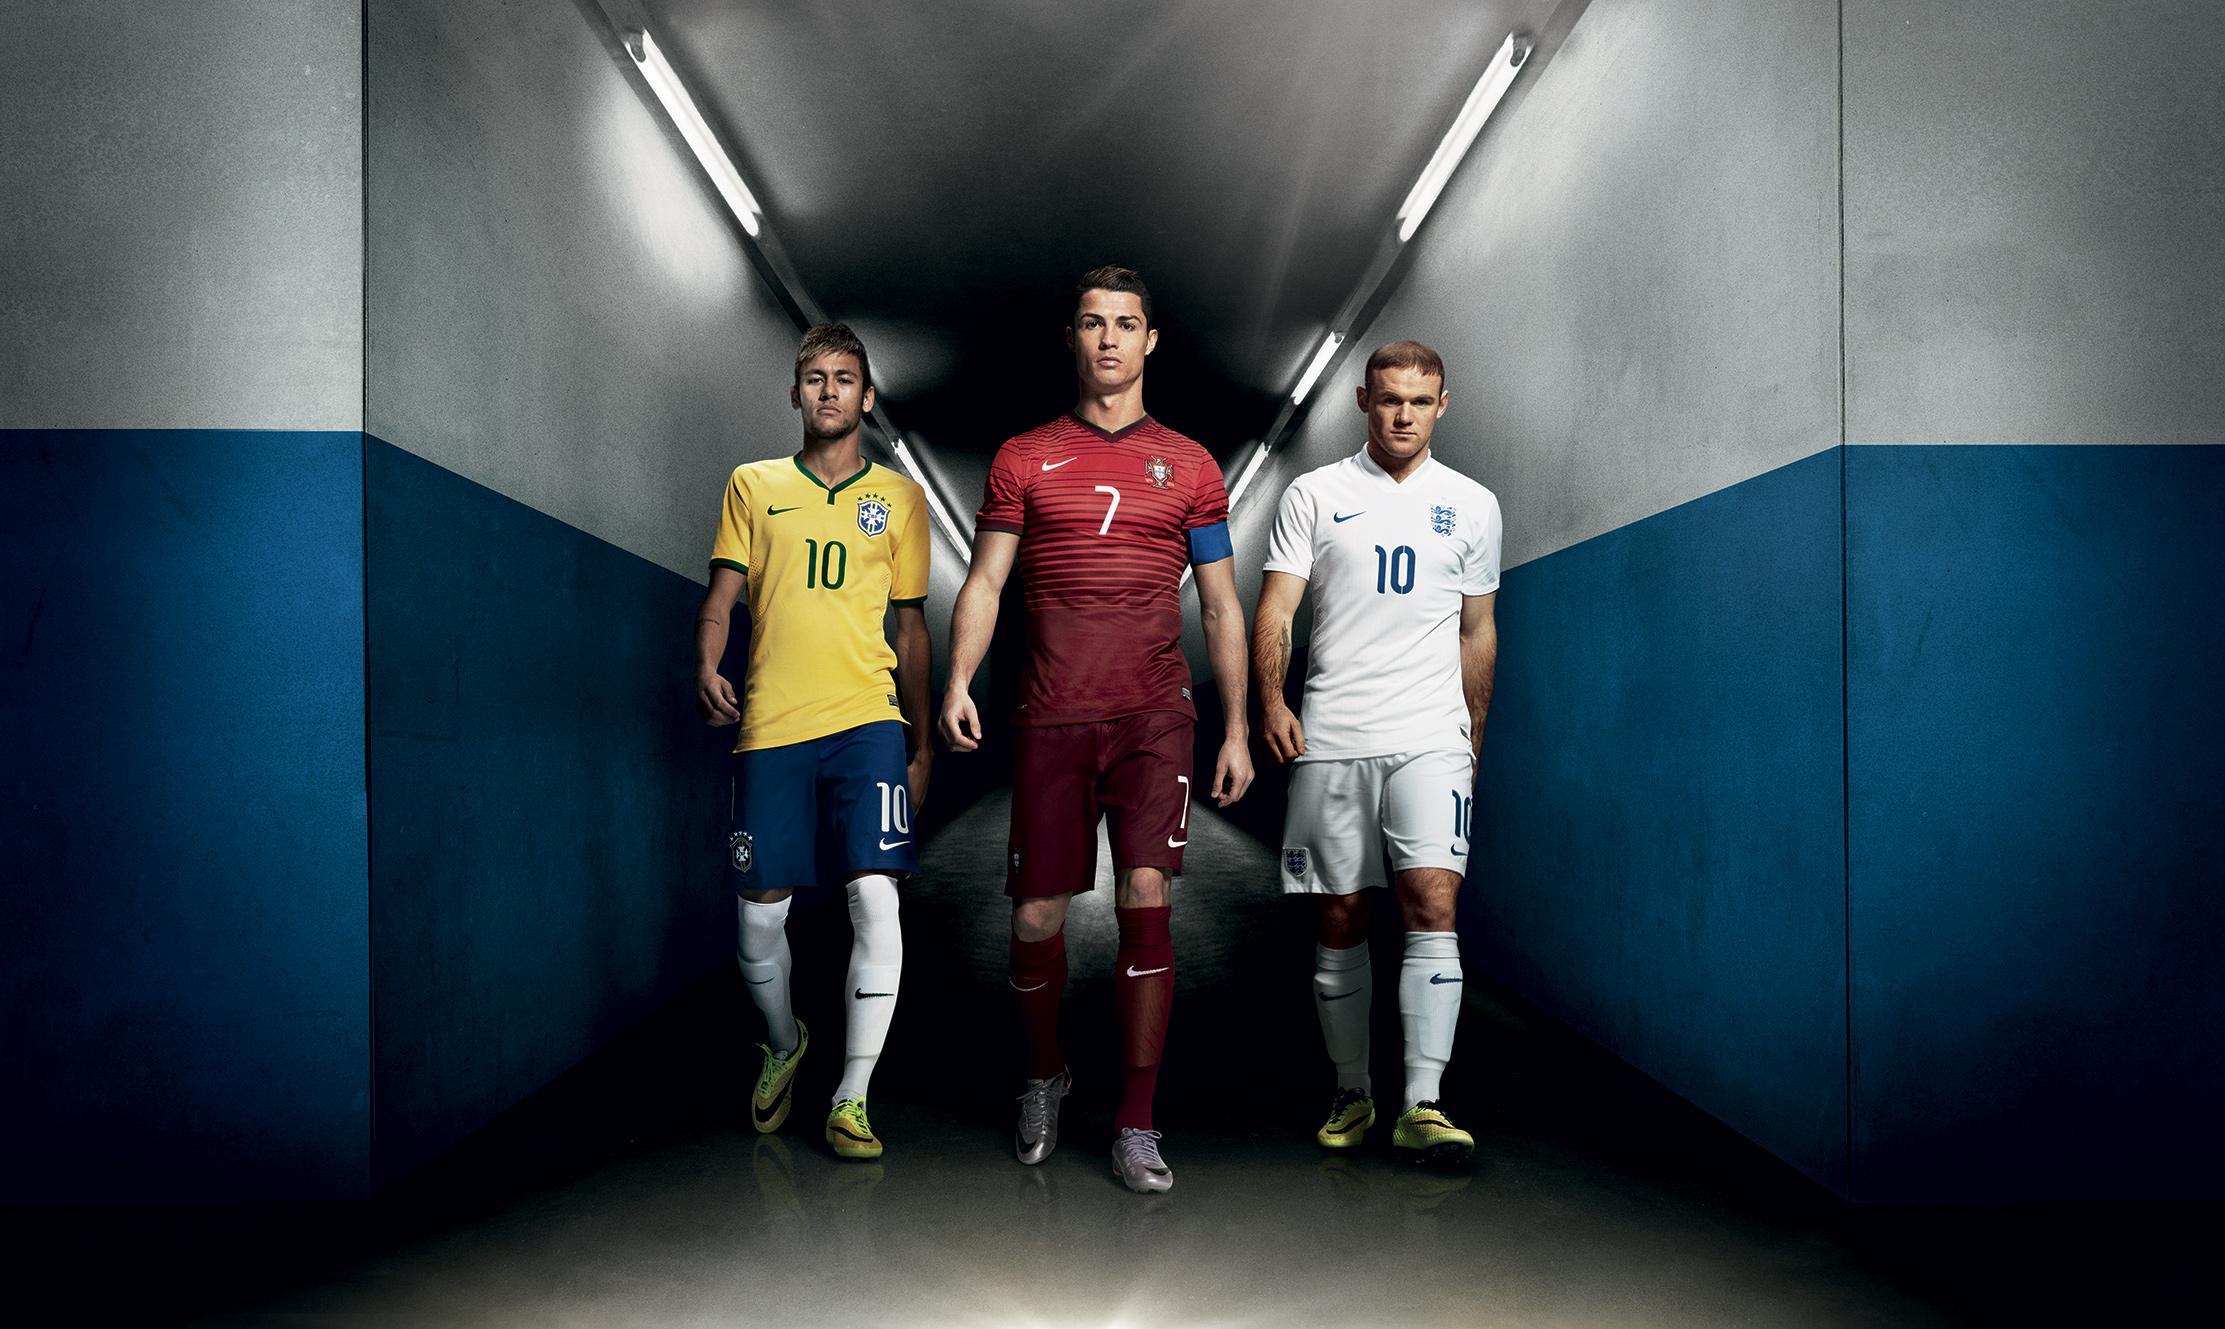 Desktop Mobiles Tablets - Ronaldo Messi Neymar Wallpaper Hd , HD Wallpaper & Backgrounds